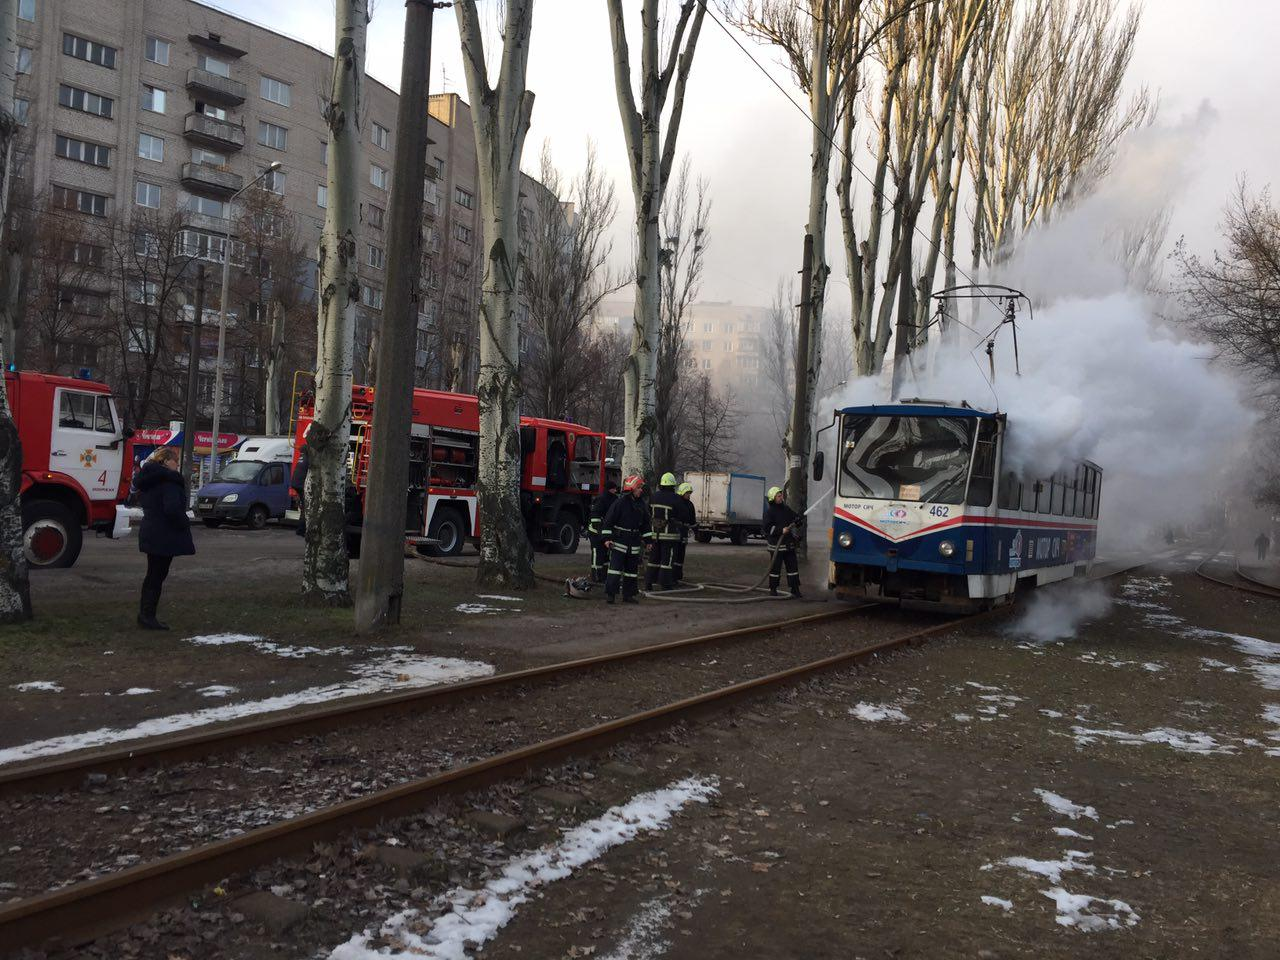 В Запорожье загорелся трамвай с пассажирами - ФОТО, ВИДЕО